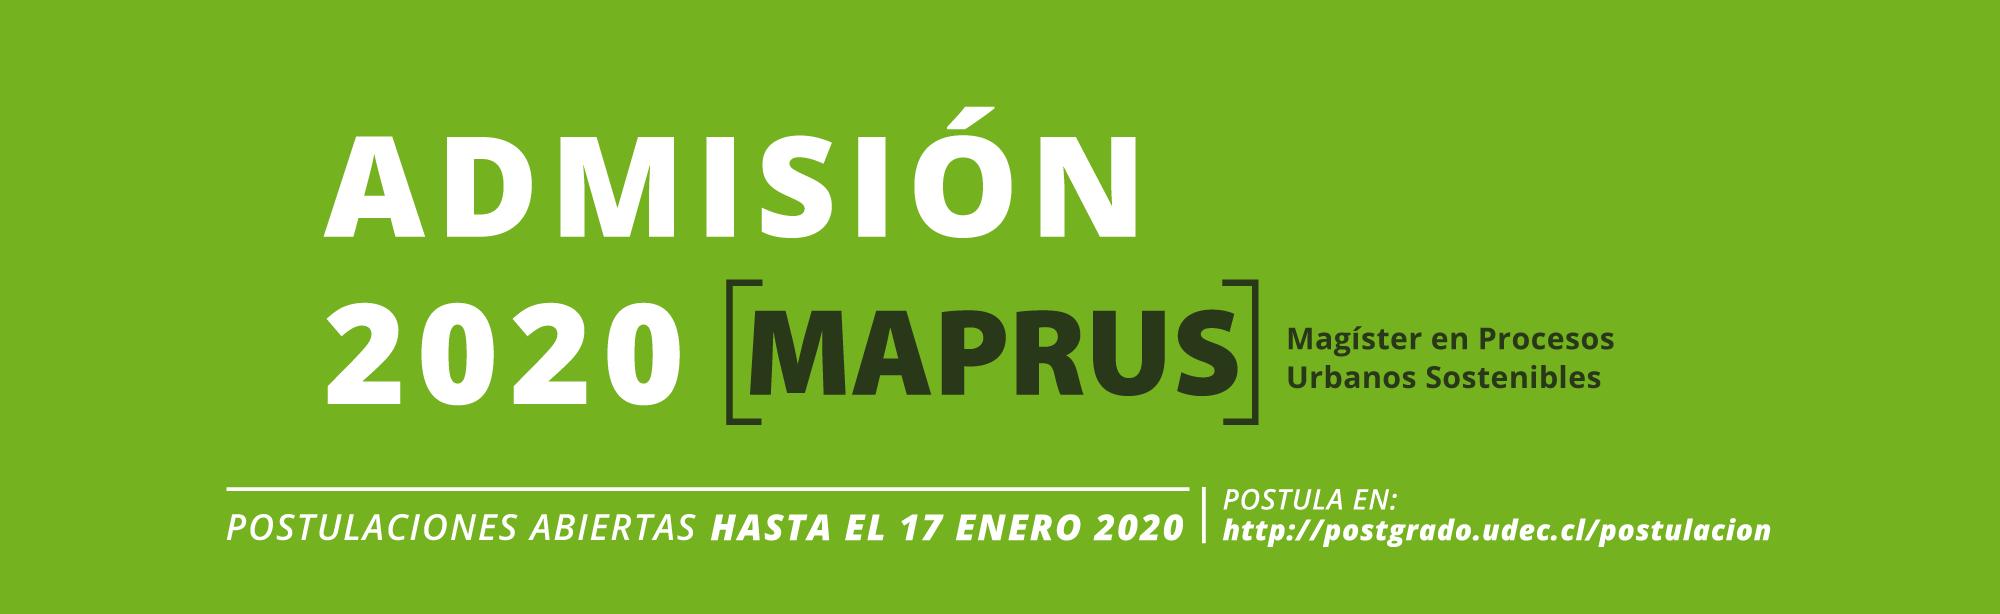 Slider_Maprus